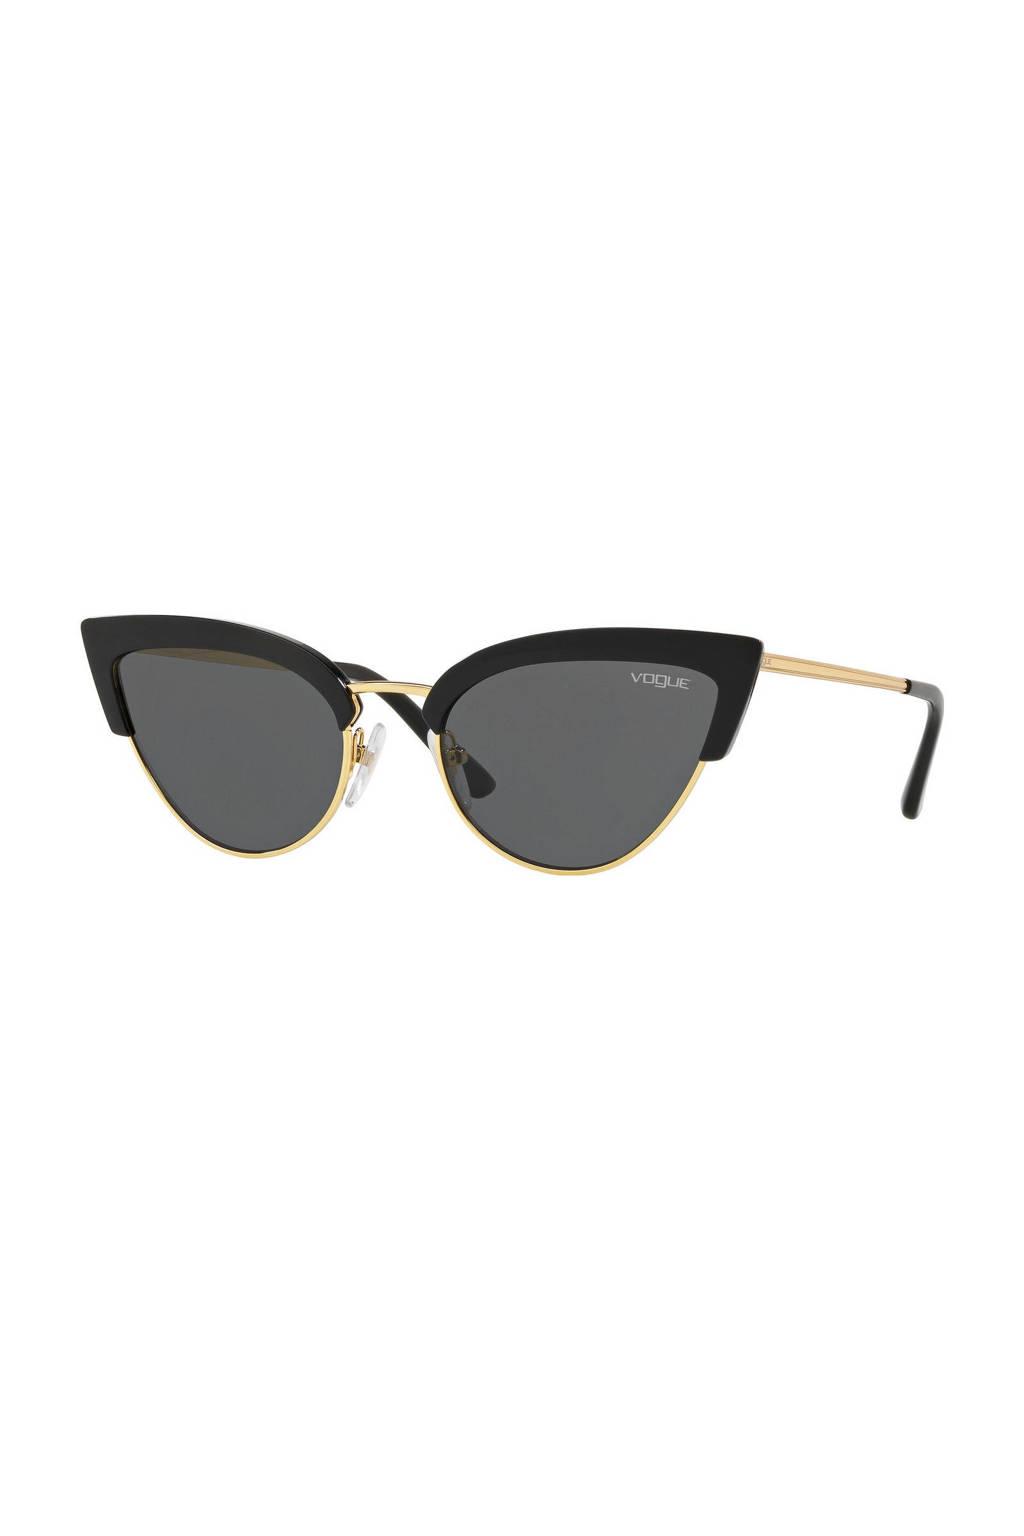 Vogue zonnebril 0VO5212S